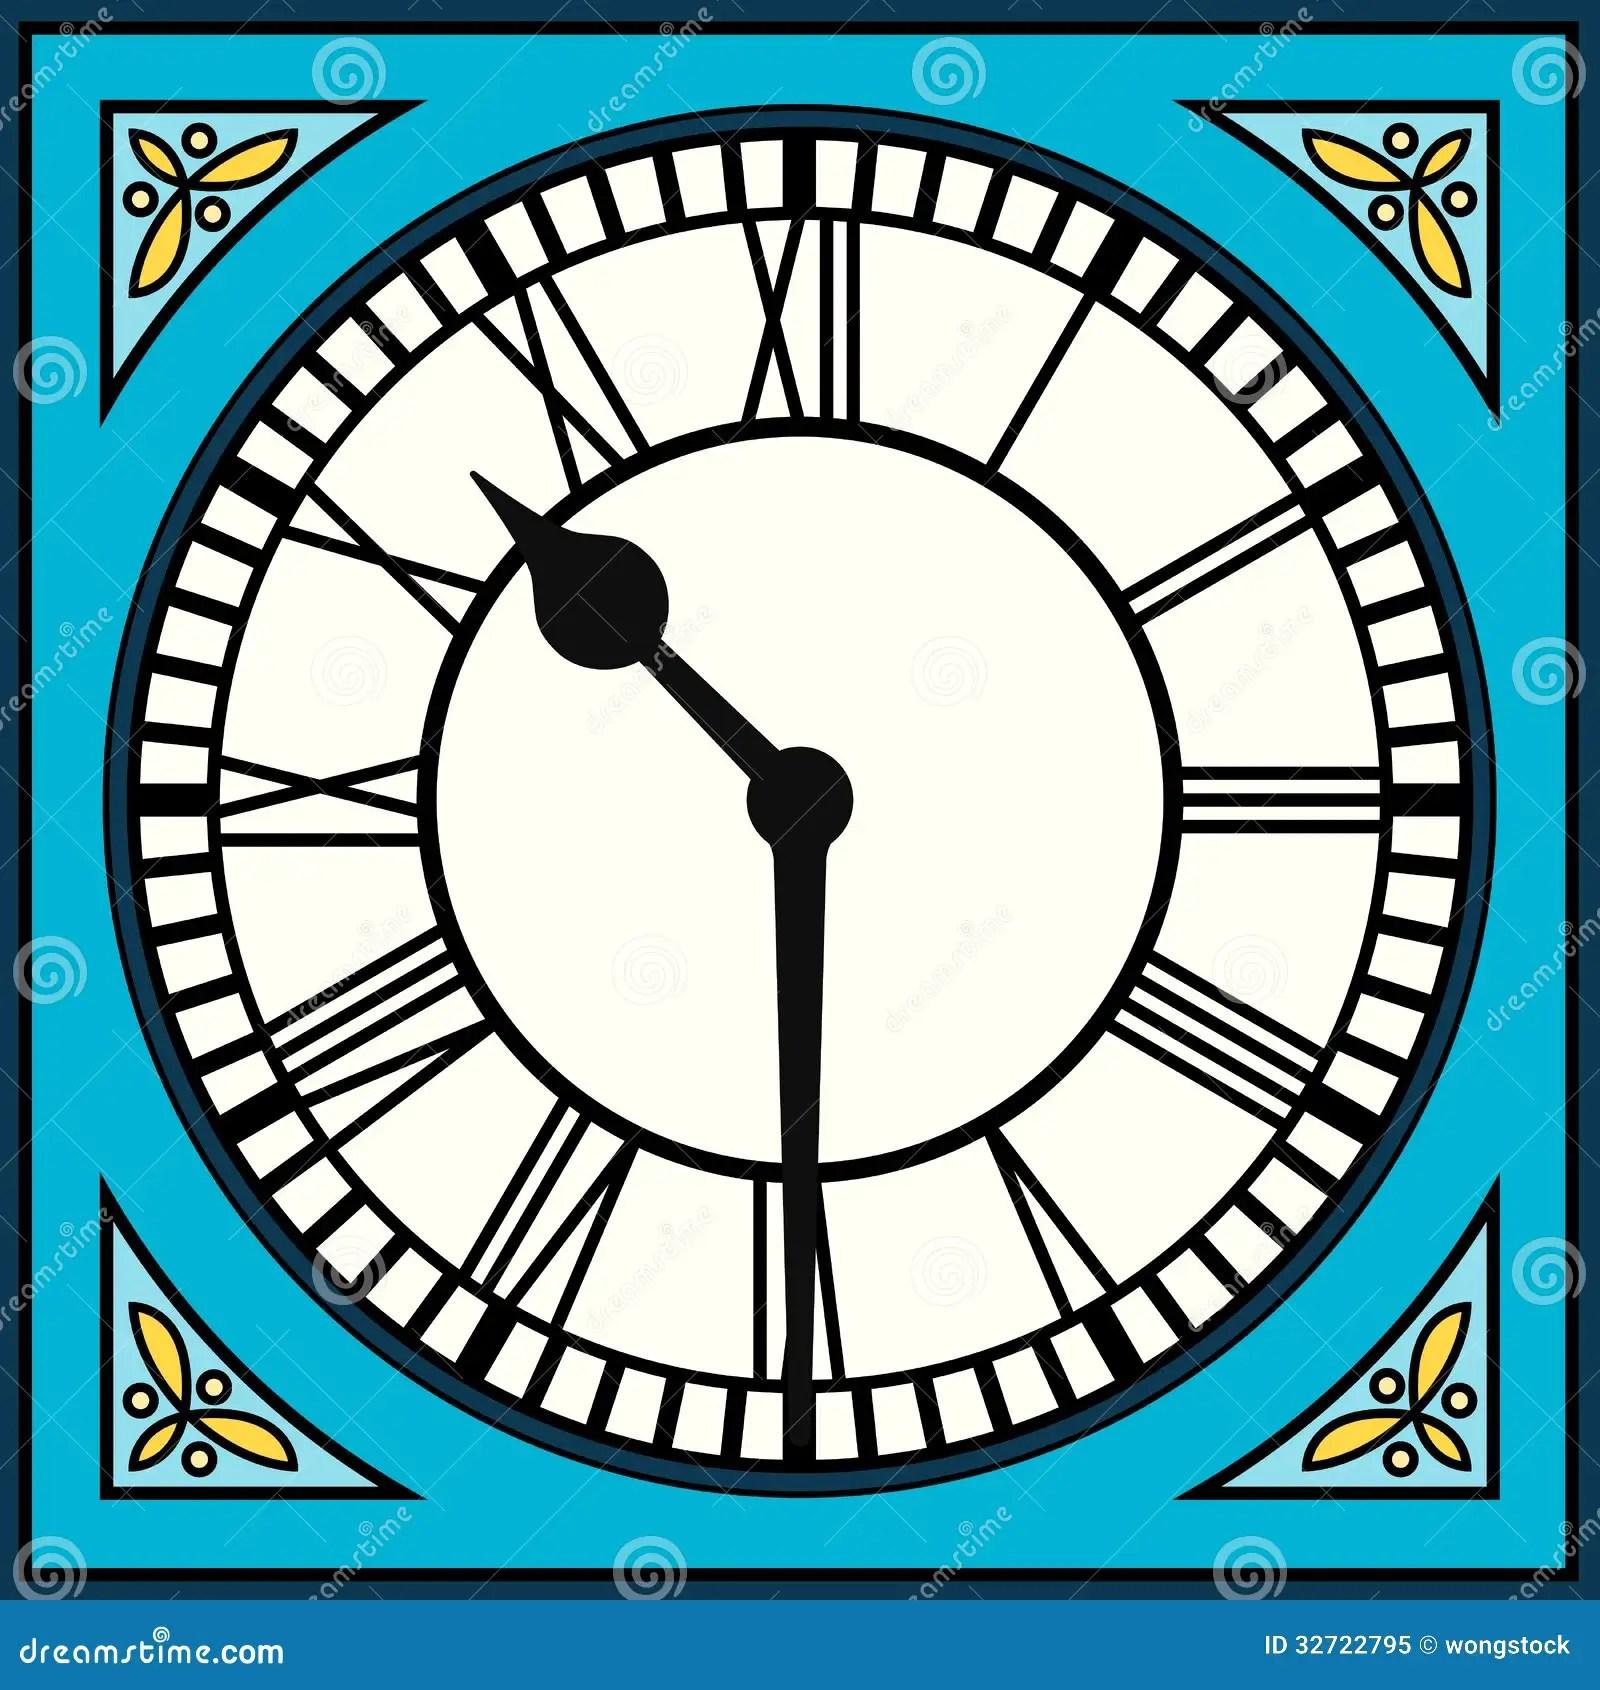 Roman Numeral Clock At Half Past Ten Stock Vector